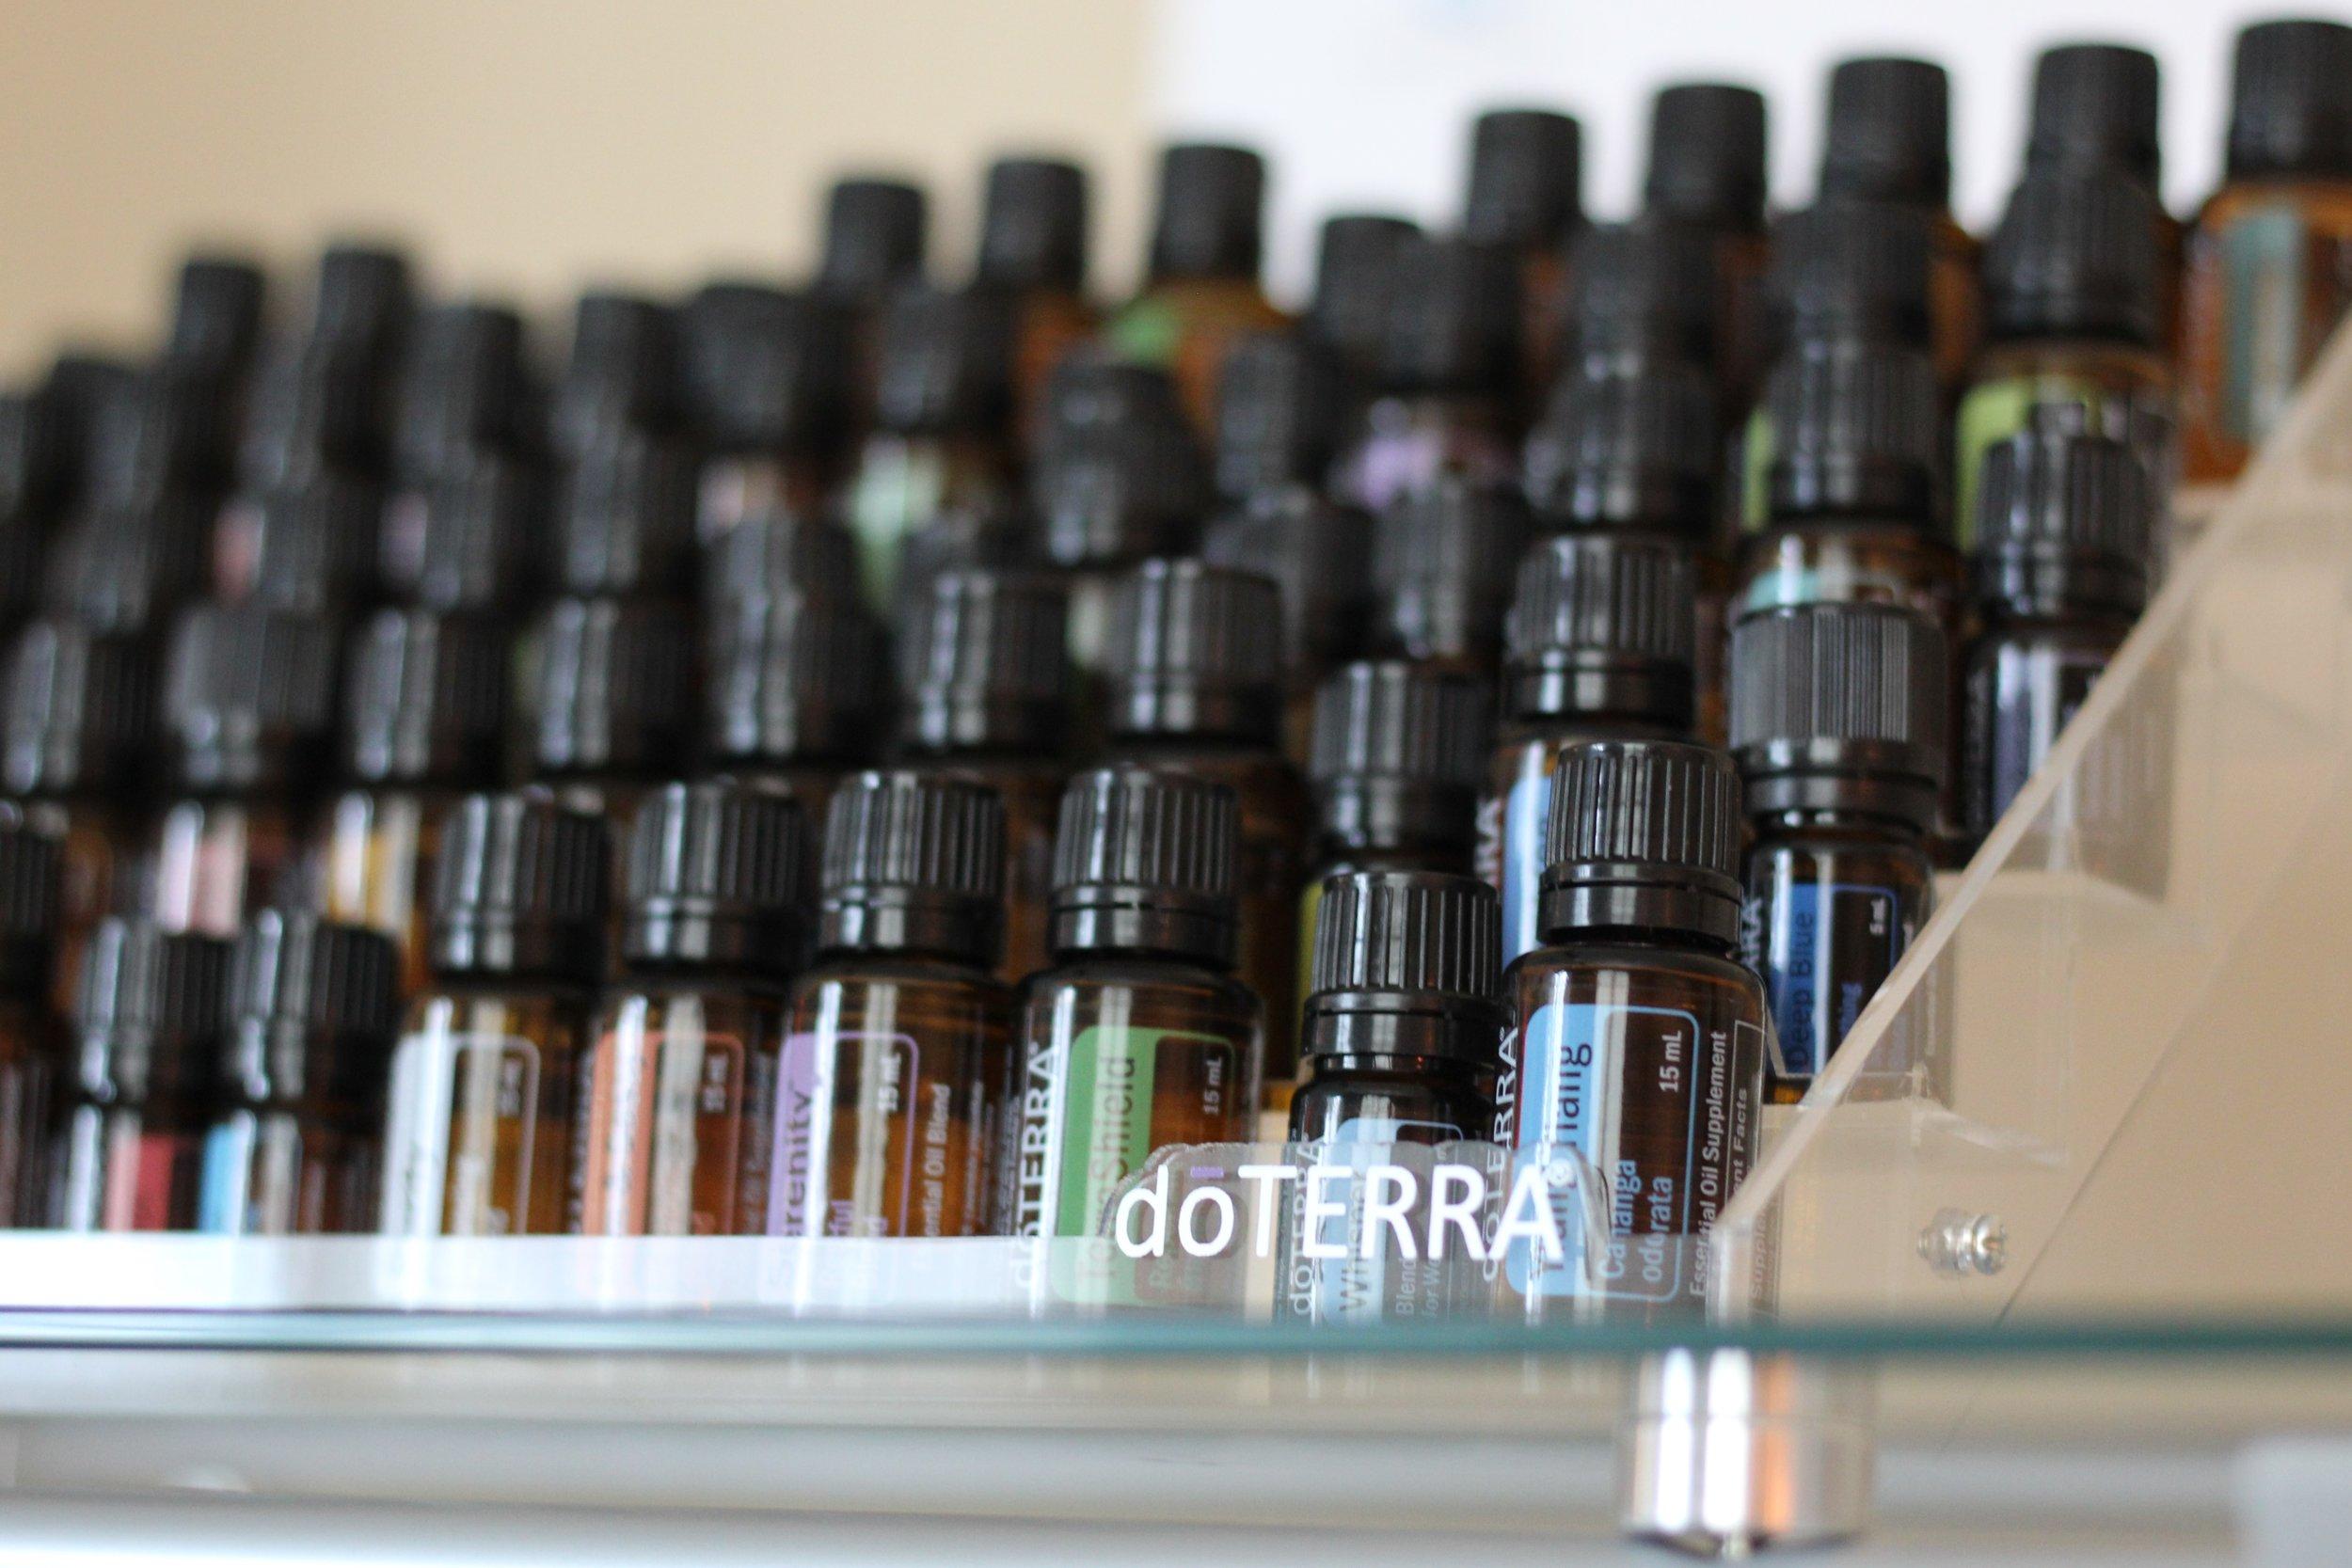 First Aid Essential Oils Soteria Wellness 6.17.19